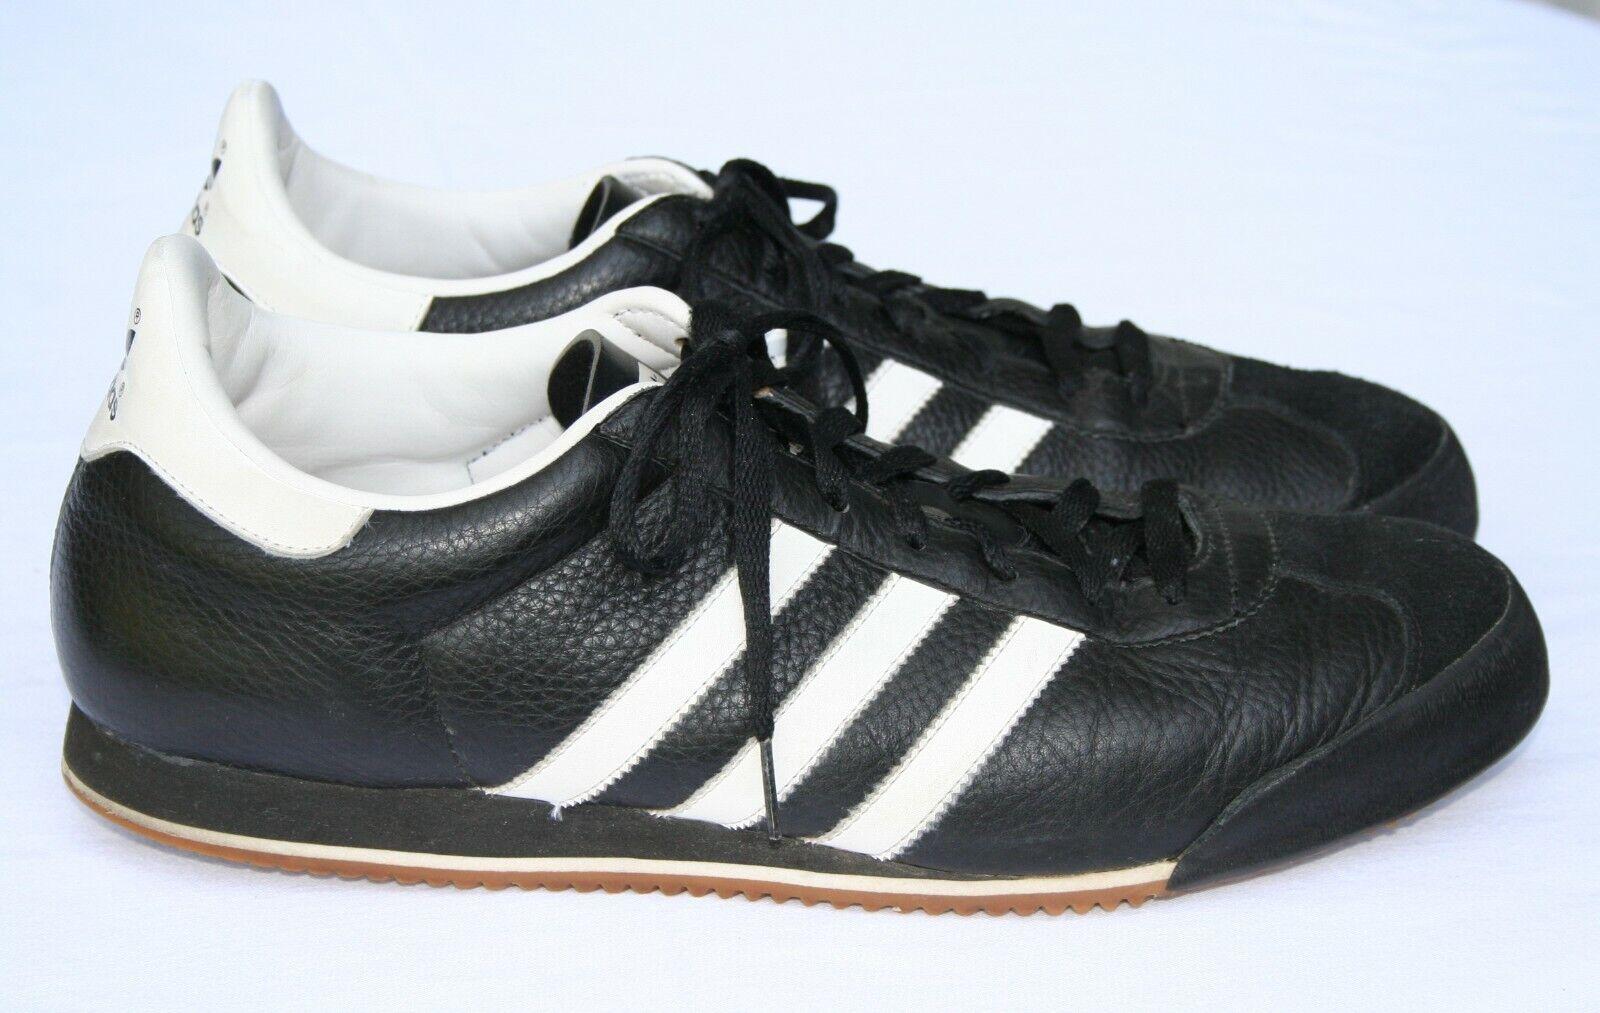 Adidas Kick Originals Sz 14 Leather Trainers Black & … - Gem